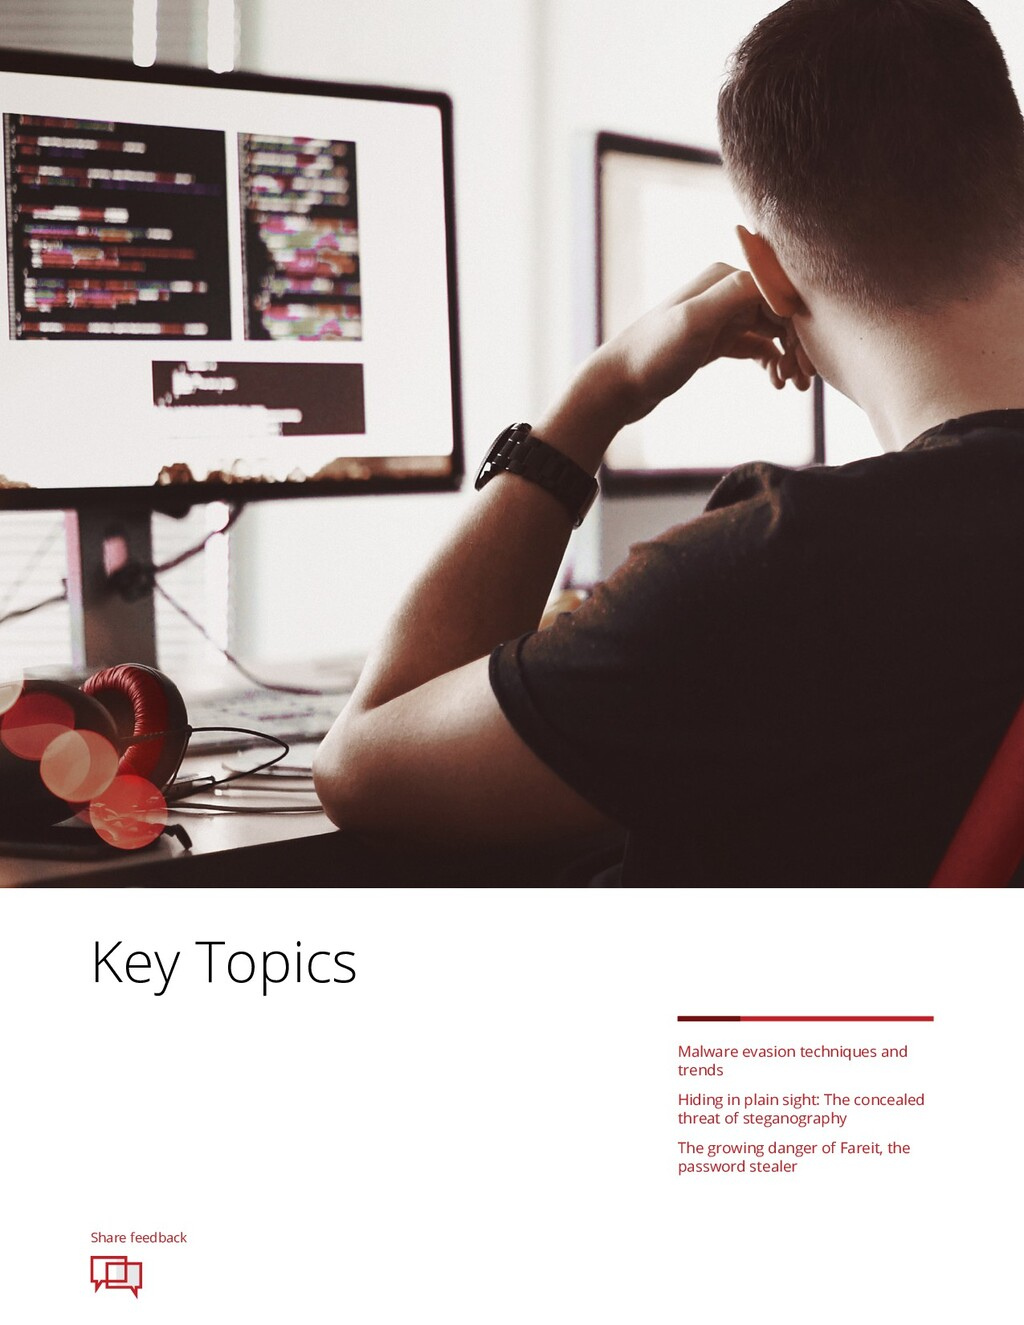 Share feedback Key Topics Malware evasion techn...